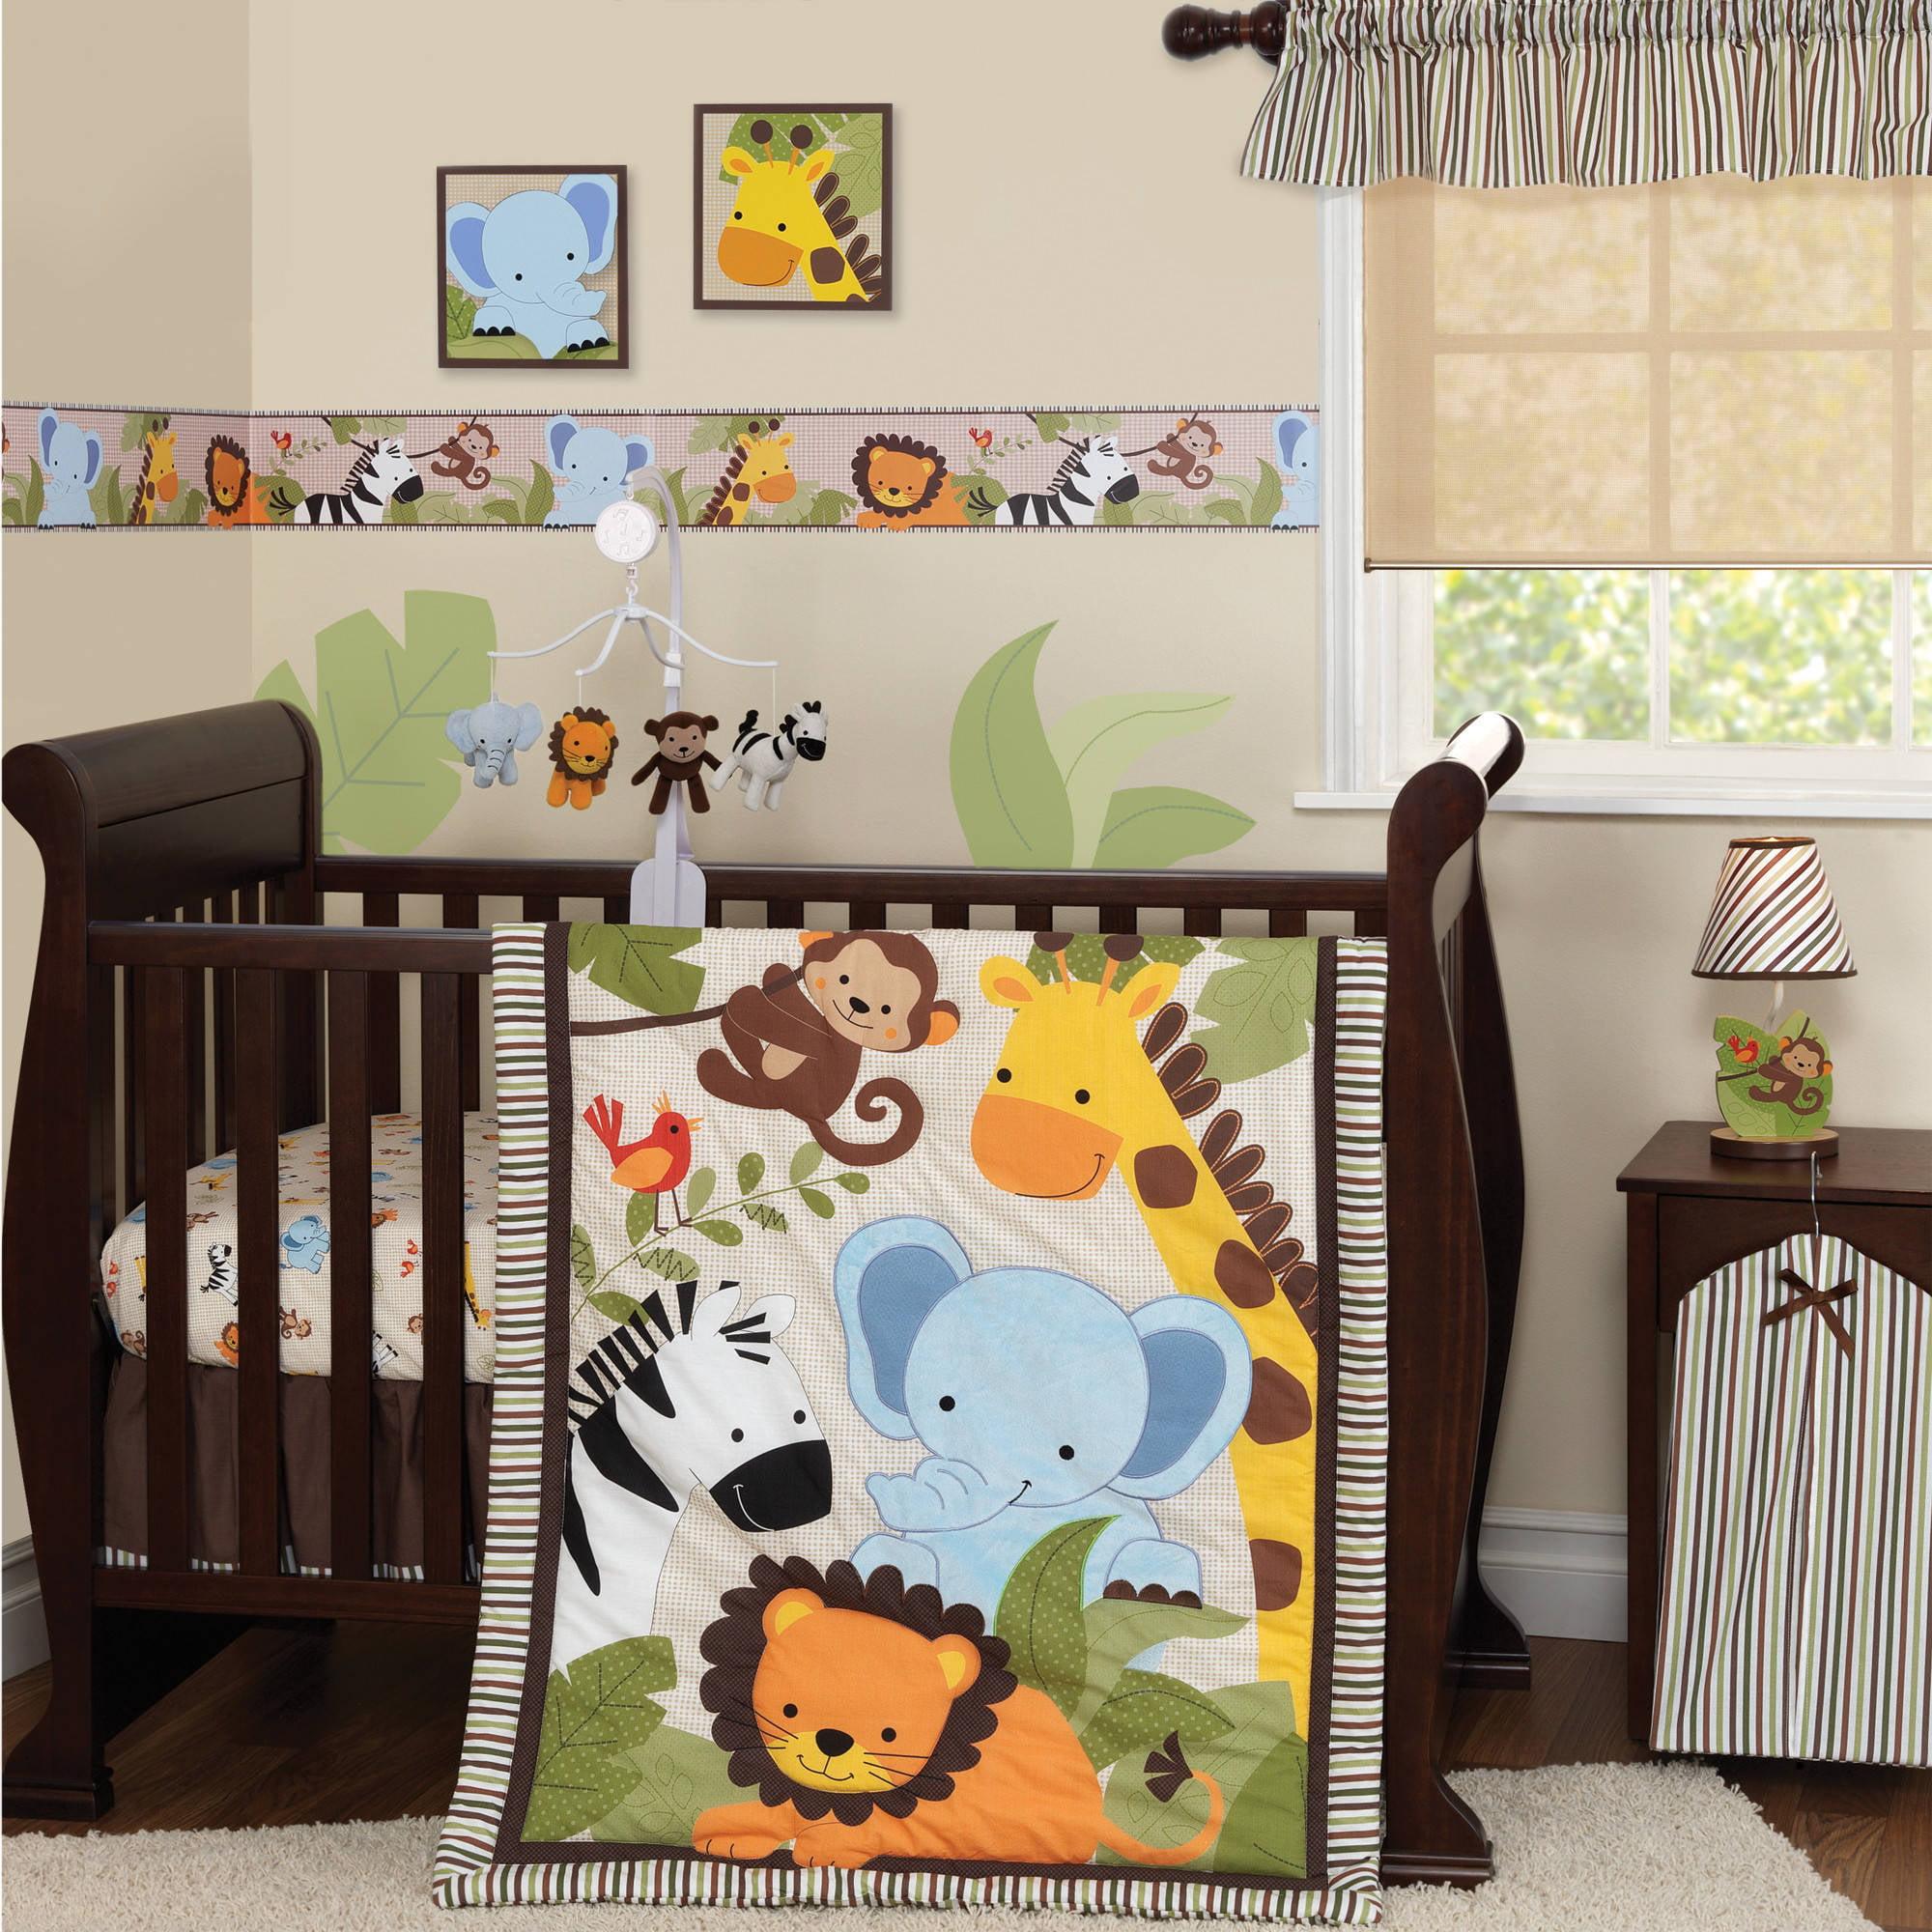 Bedtime Originals by Lambs & Ivy - Jungle Buddies 3-Piece Crib Bedding Set, Brown